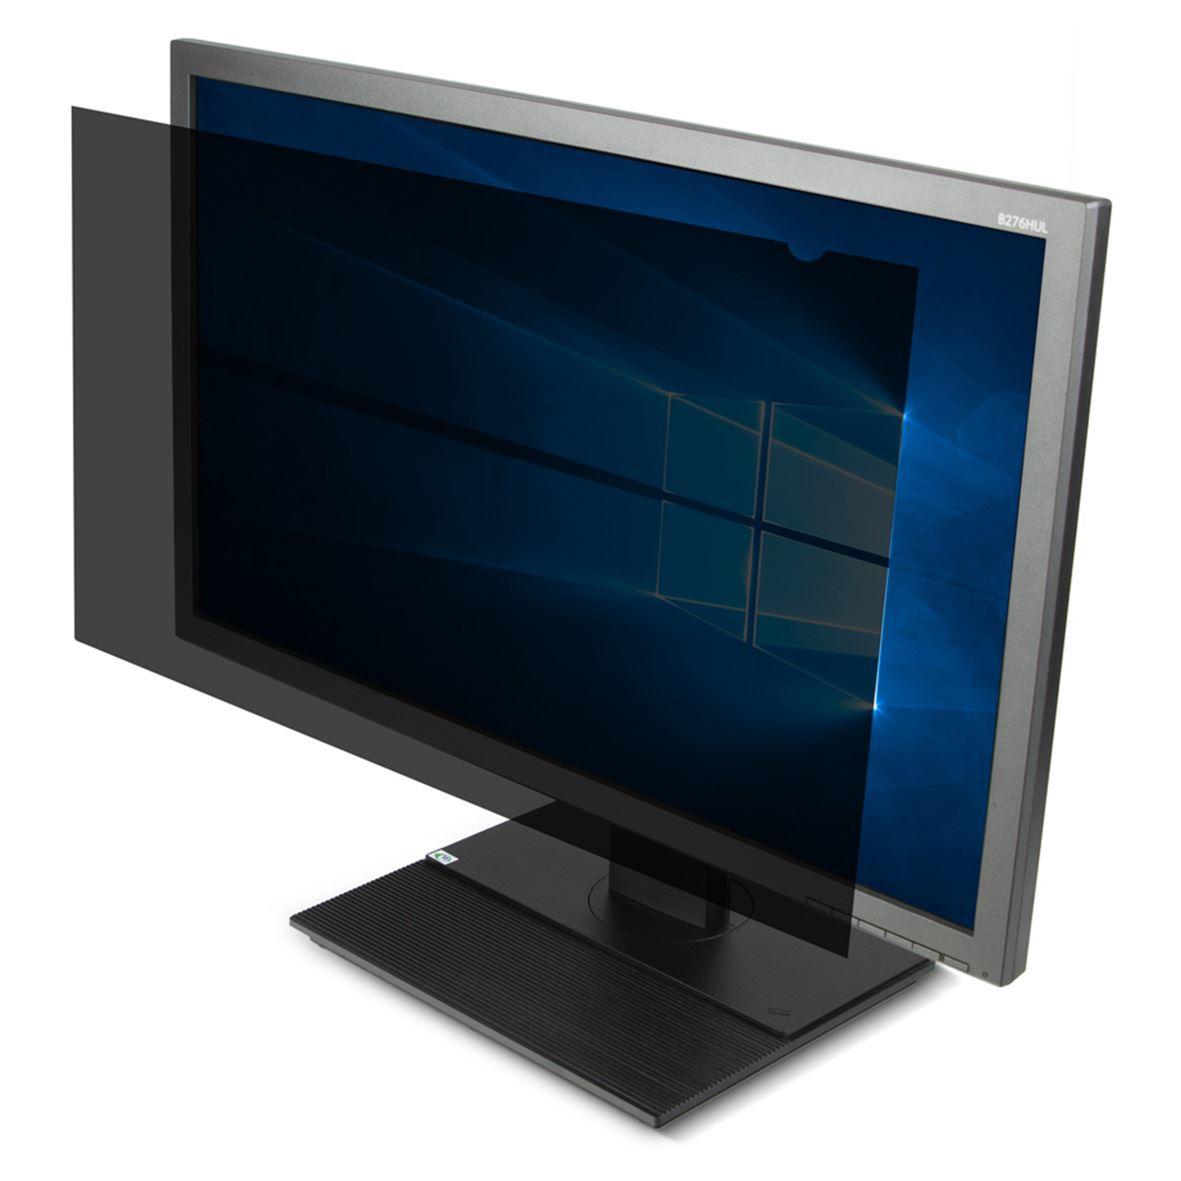 Targus ASF215W9EU display privacy filters Frameless display privacy filter